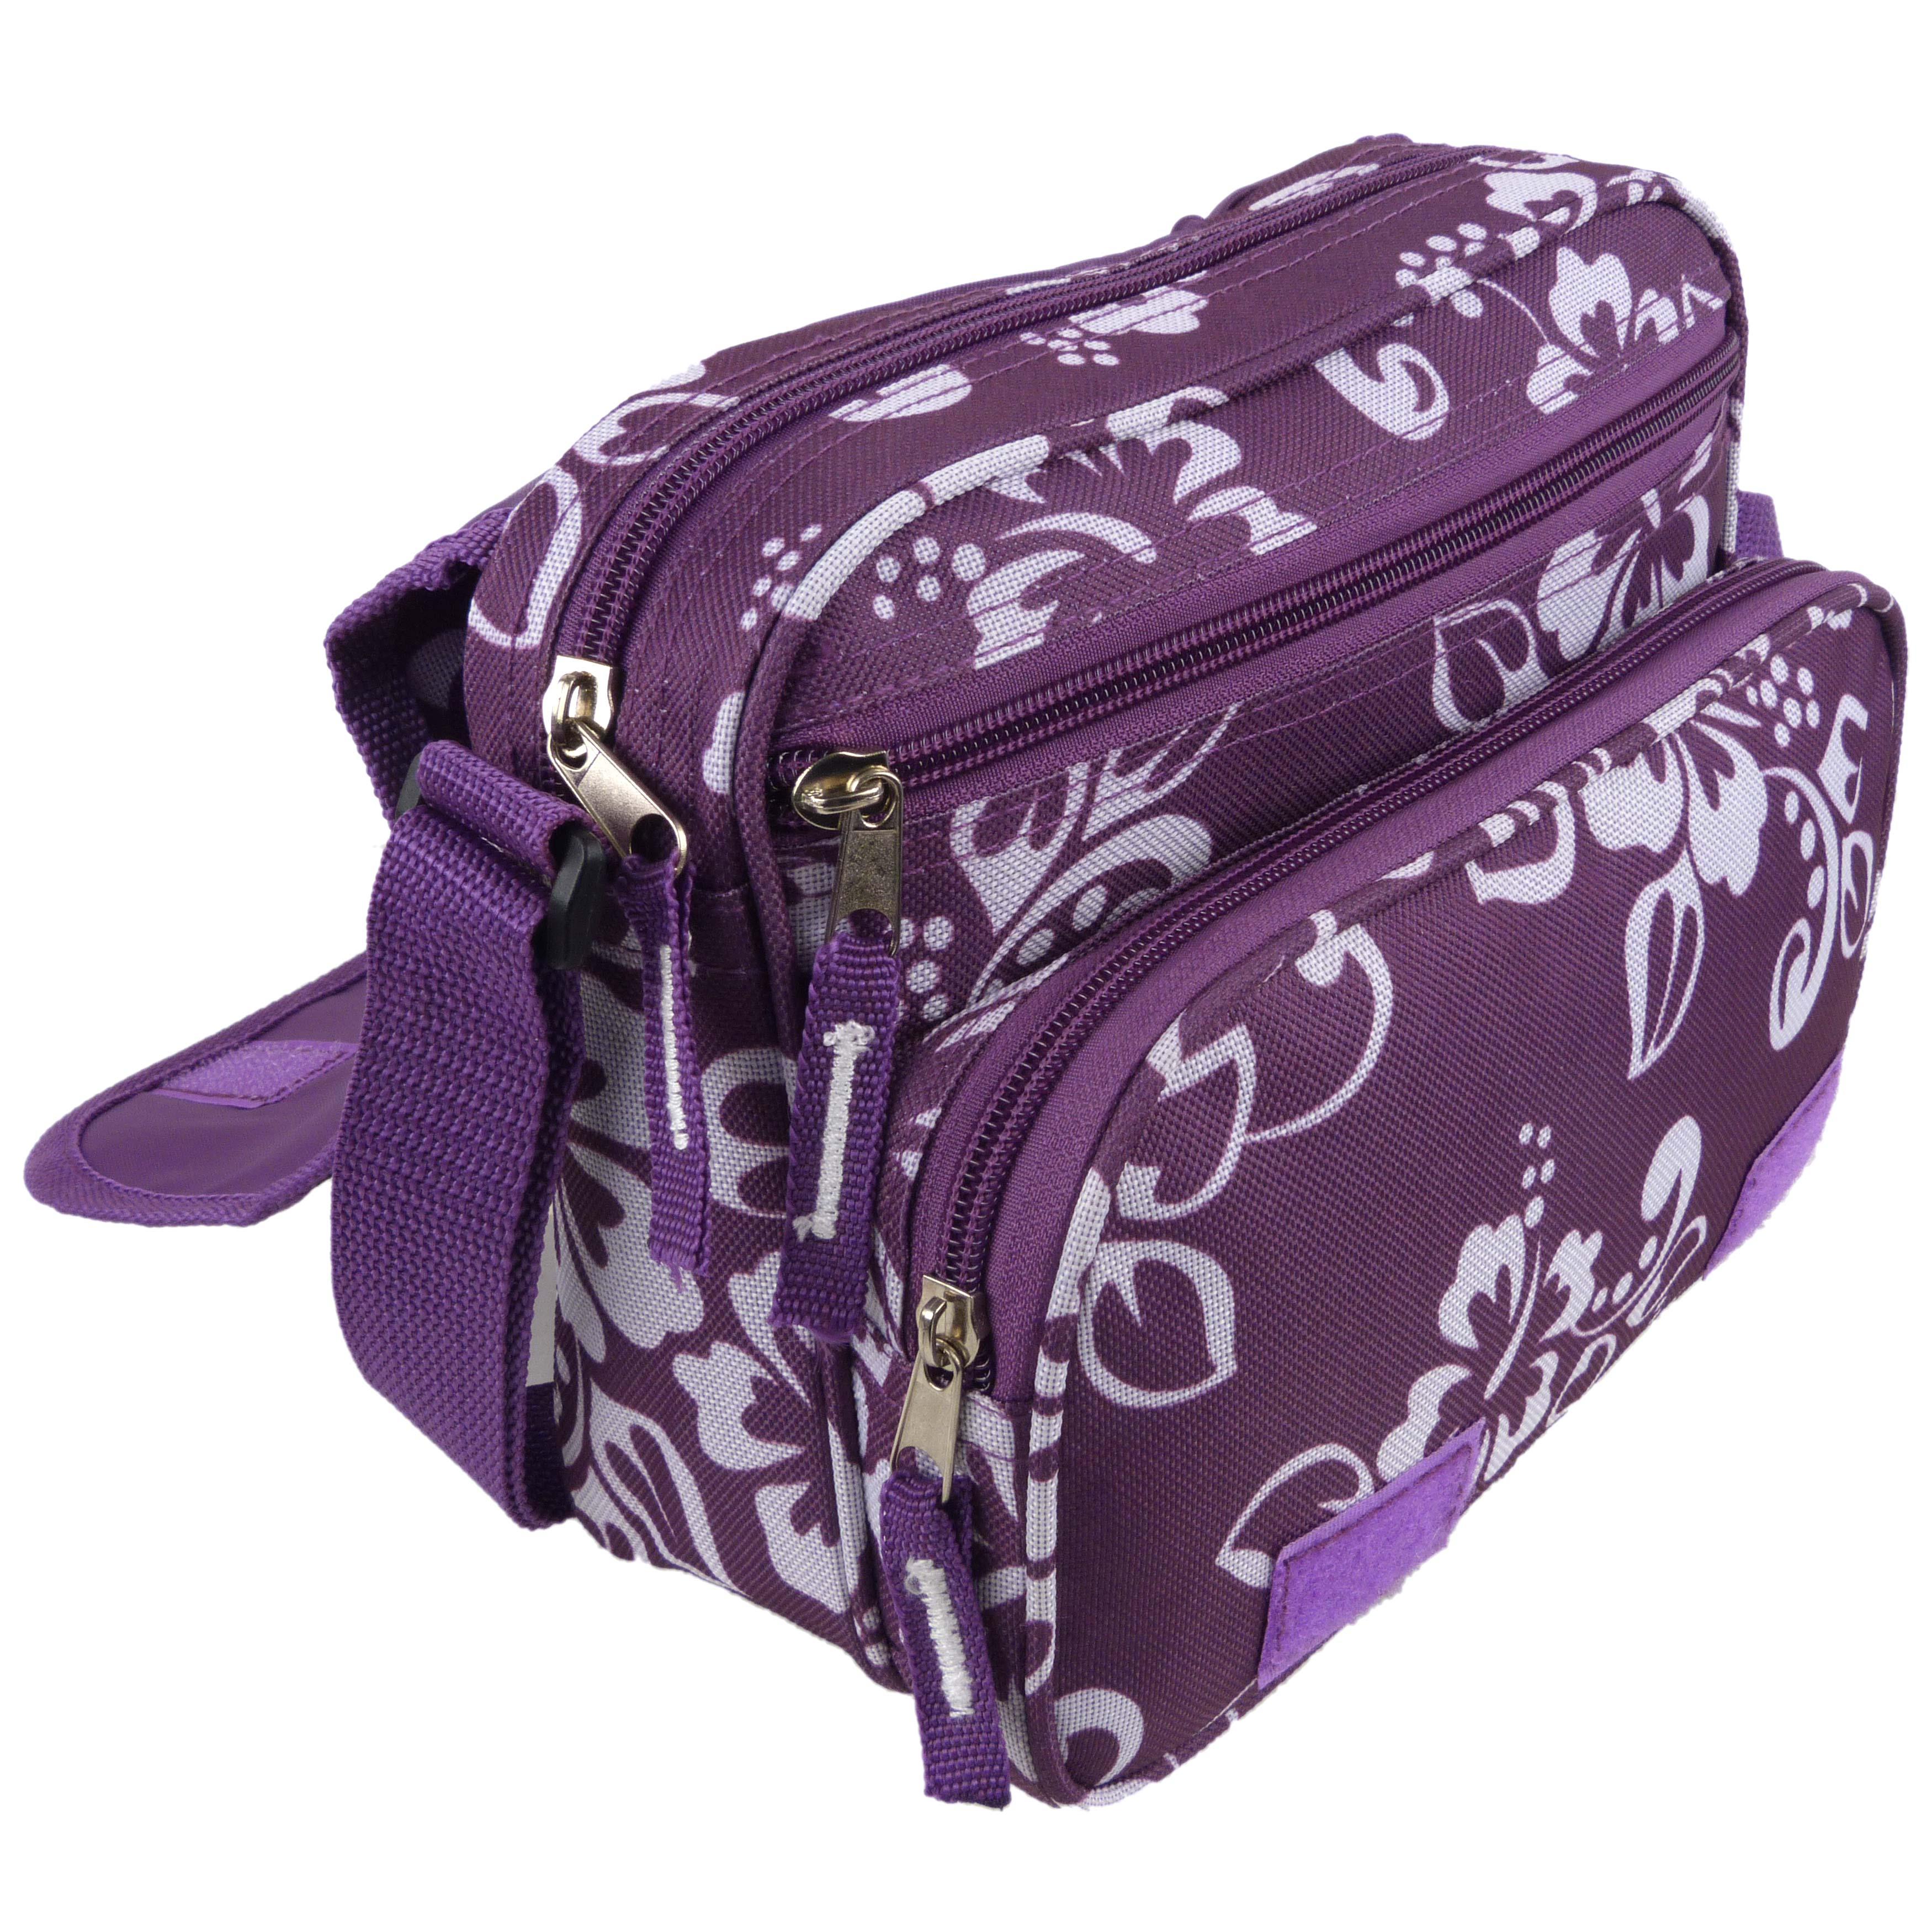 Ladies-Girls-Medium-Hibiscus-Shoulder-Travel-Cross-Body-Bag-by-RED-X-Floral thumbnail 13